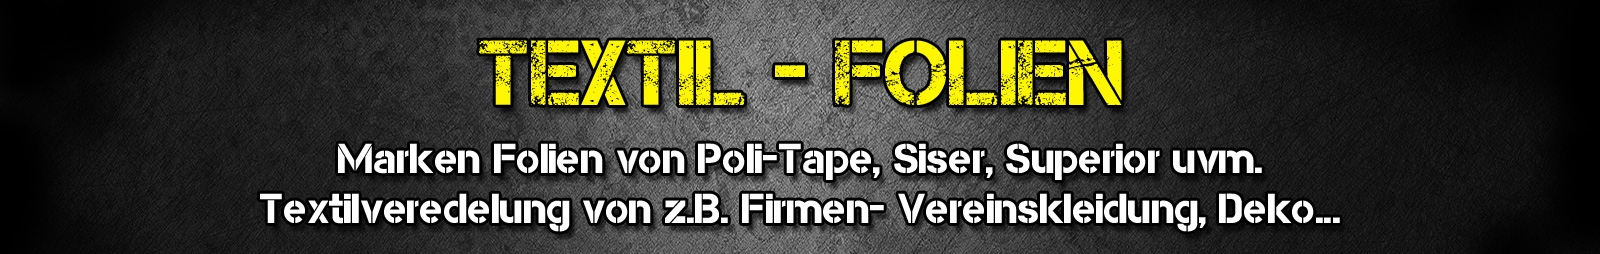 Vinyl - Folien